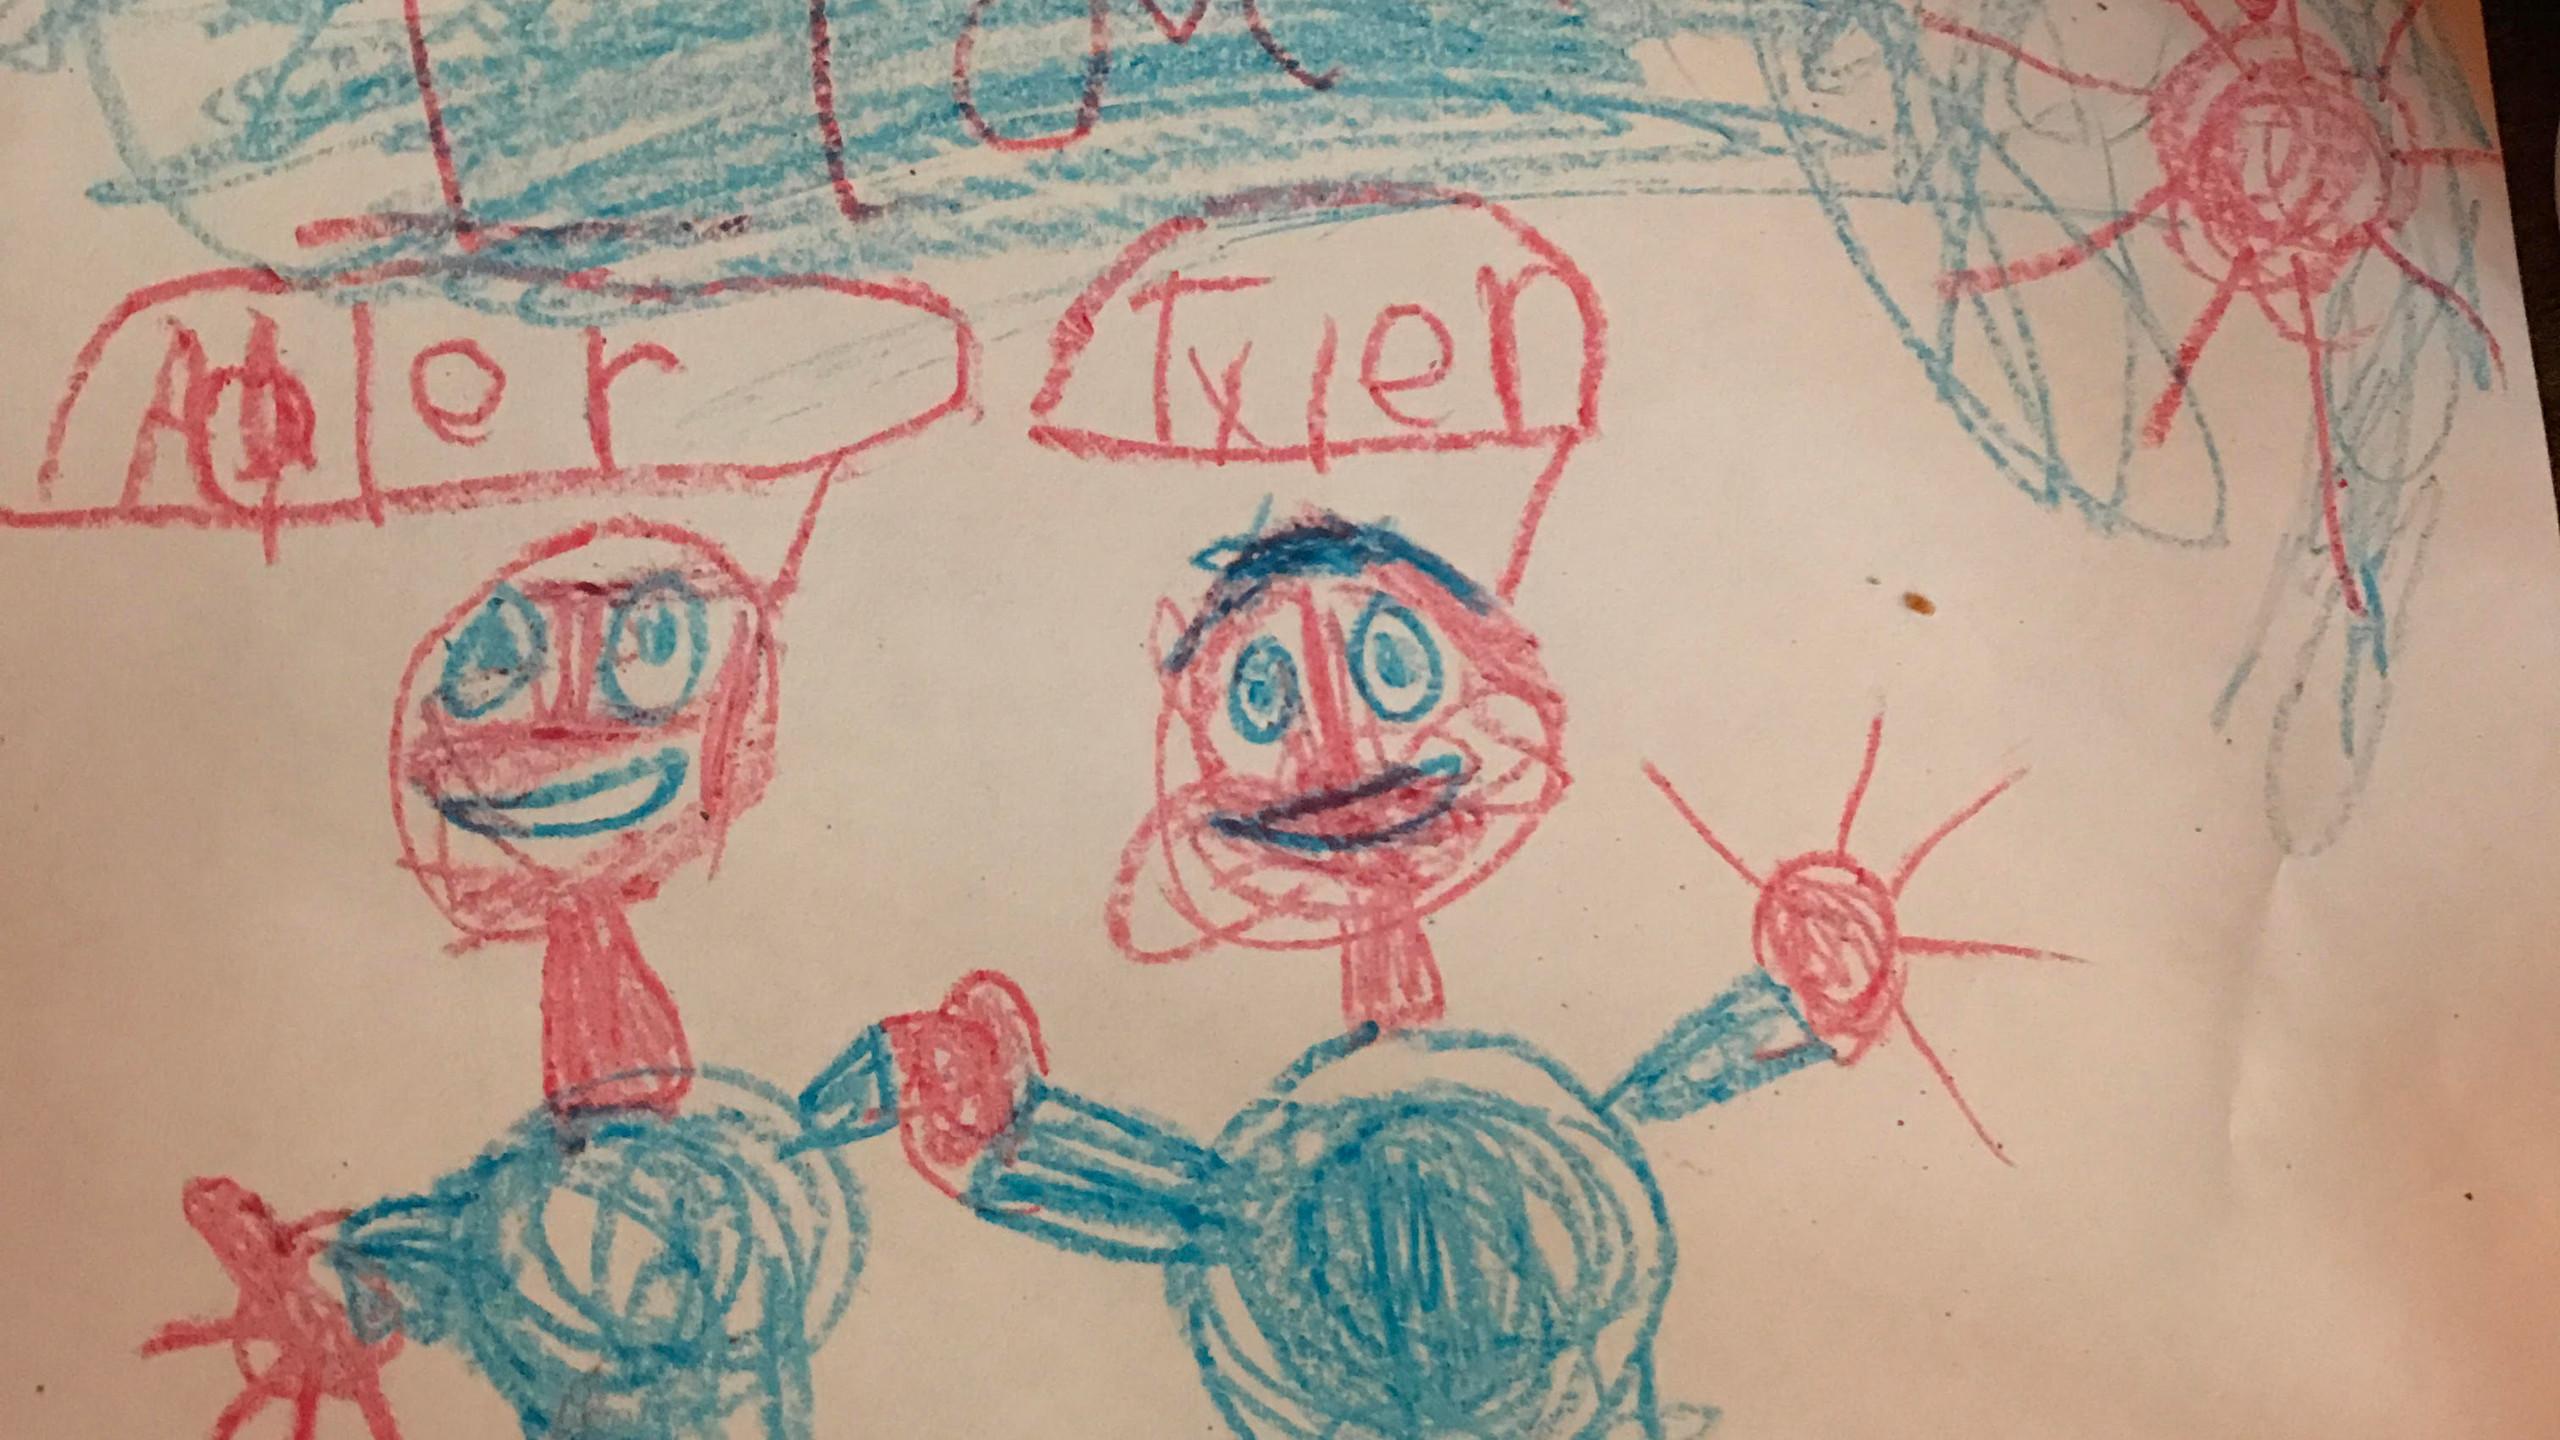 My kiddo made this for Adler